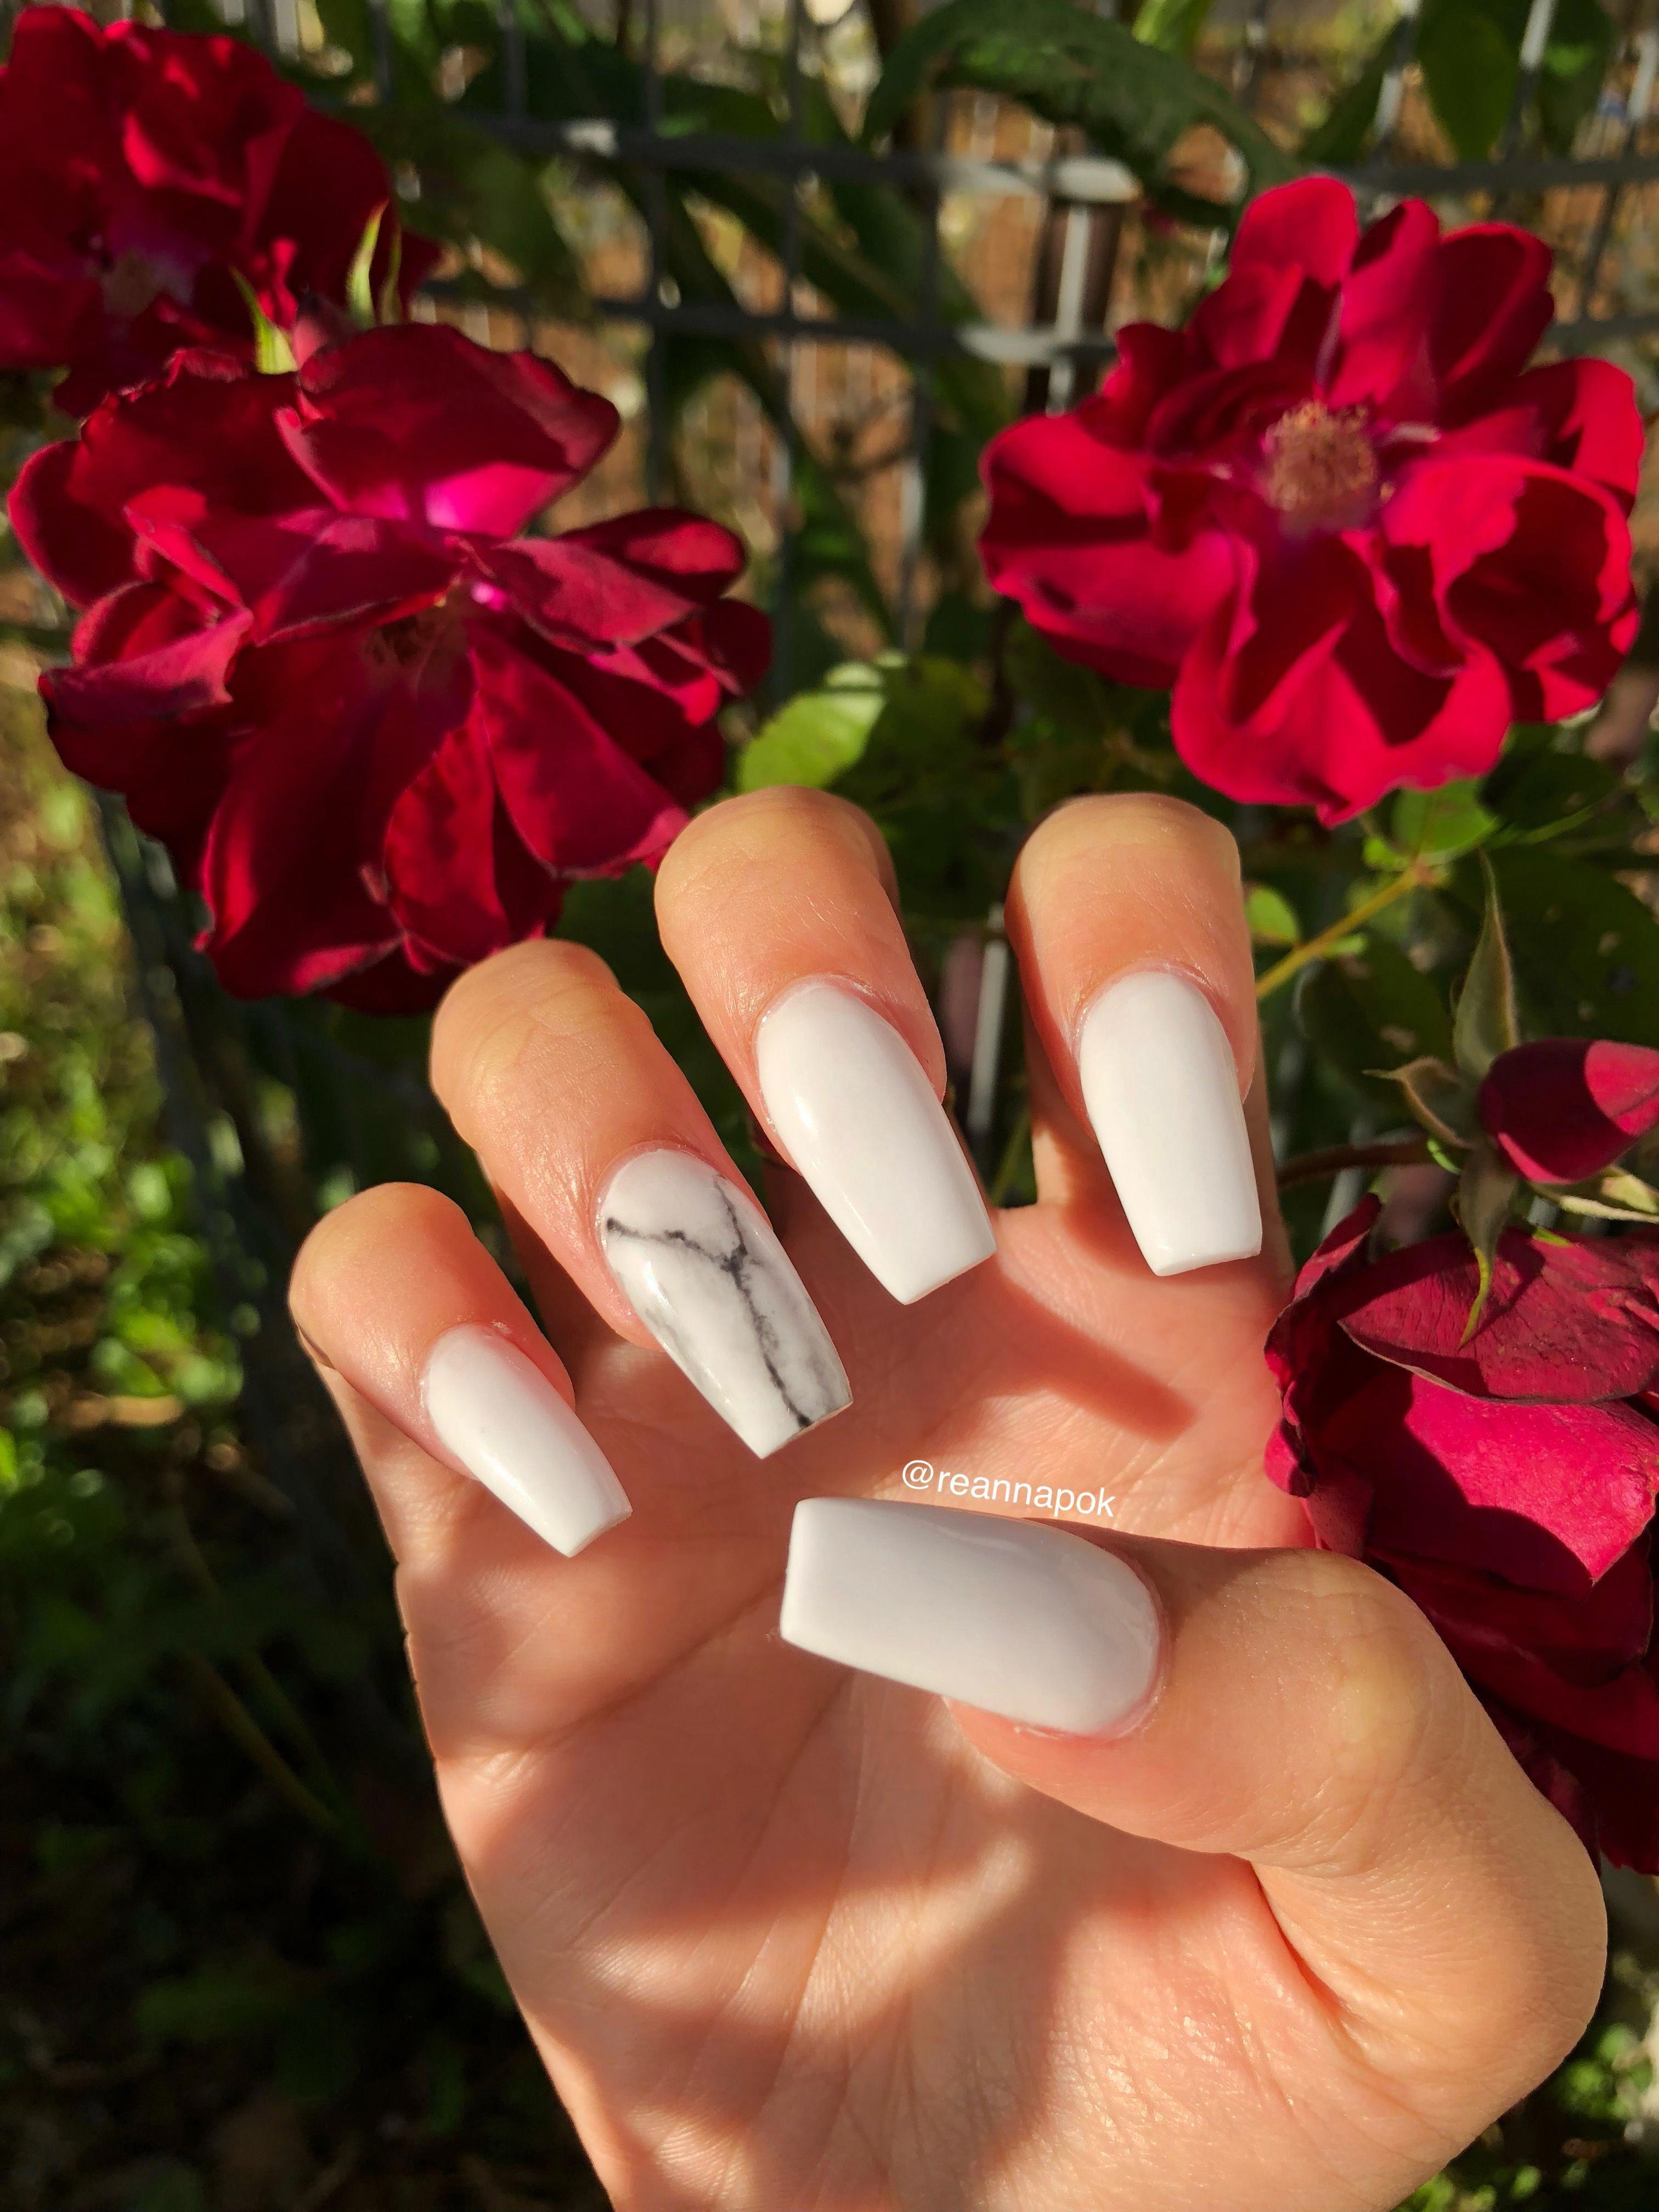 White Marble Acrylic Nails Acrylicnaildesigns White Acrylic Nails Marble Acrylic Nails Gorgeous Nails